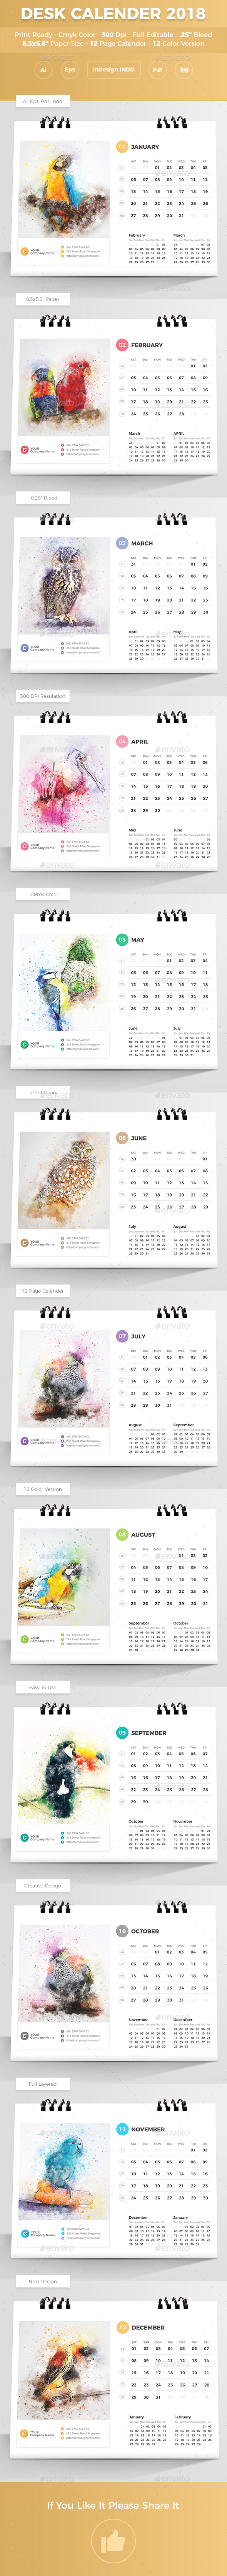 Desk Calender 2018 - Calendars Stationery